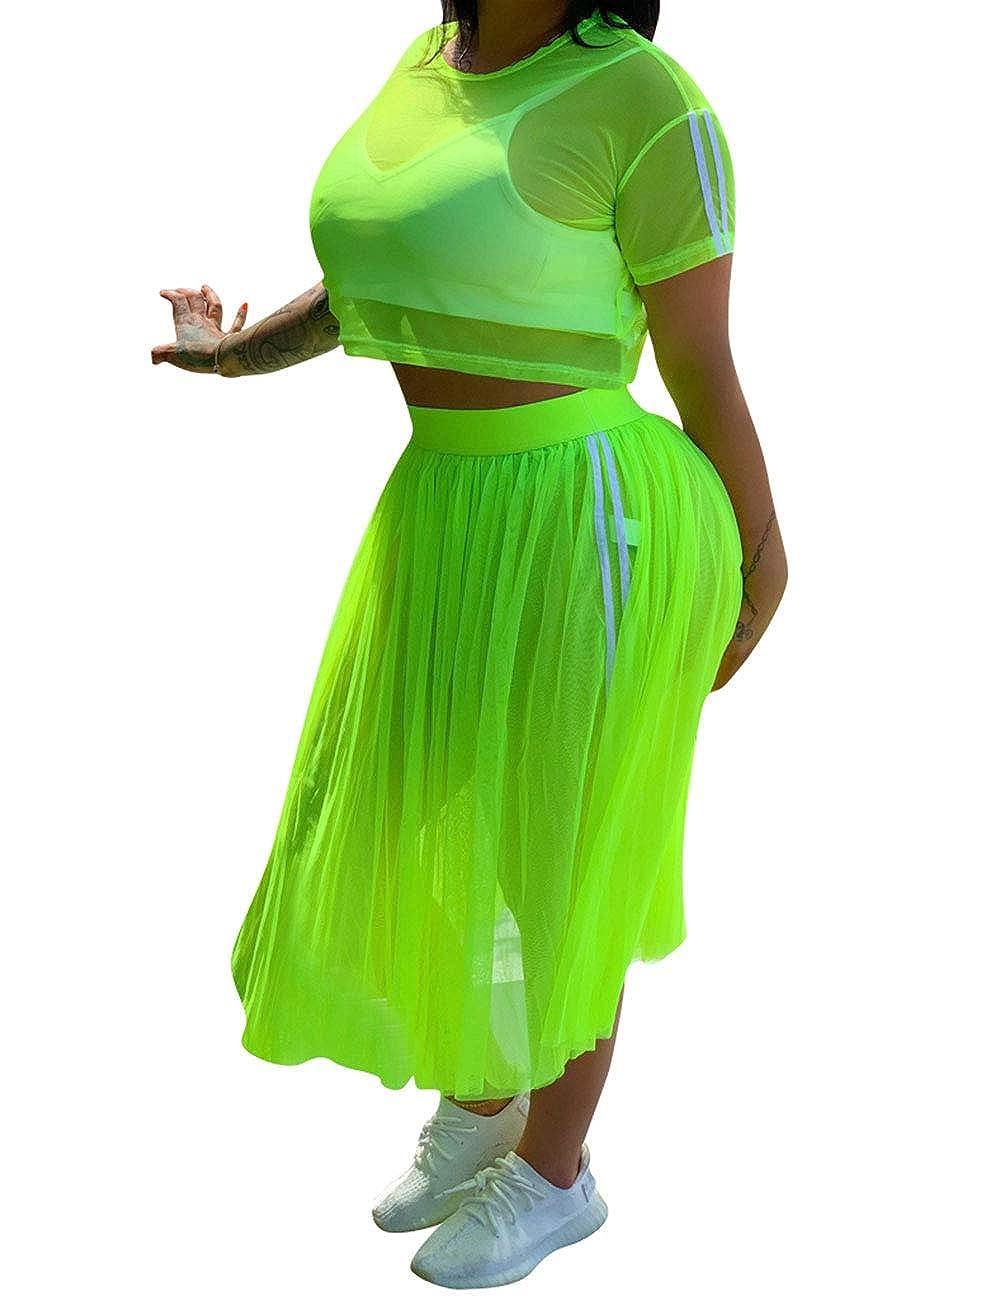 Womens 2 Piece Dress Outfits Sheer Mesh Short Sleeve Tops Midi Skirt Set Jumpsuits